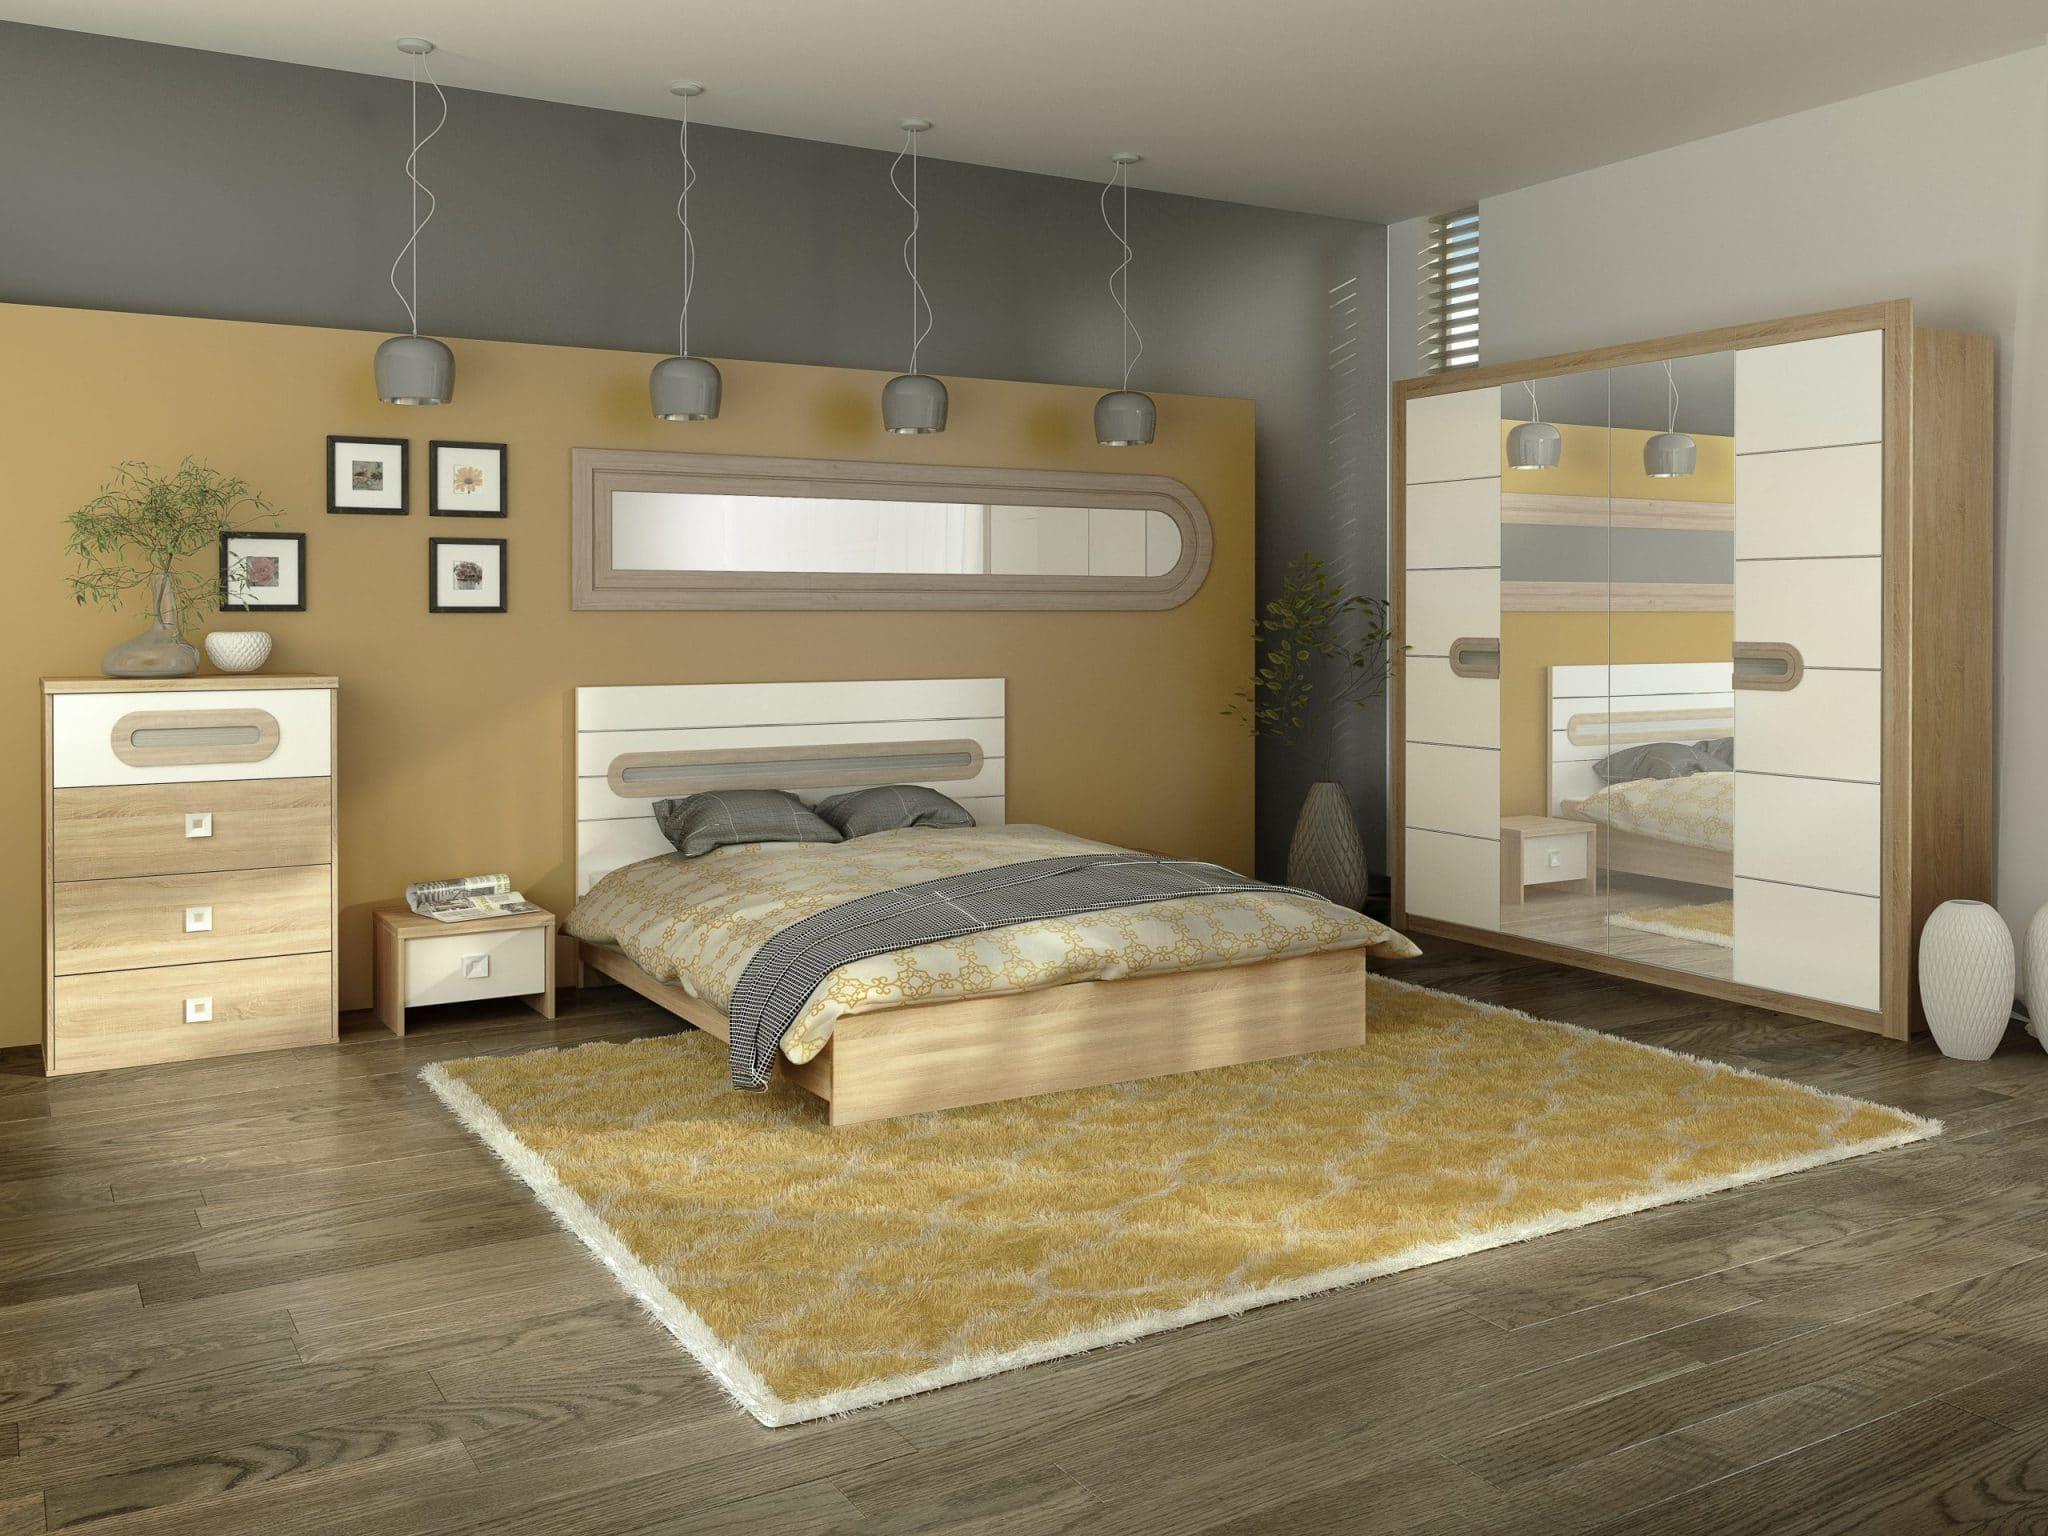 set Dormitor Kent 5 piese complet dulap mare cu oglinda